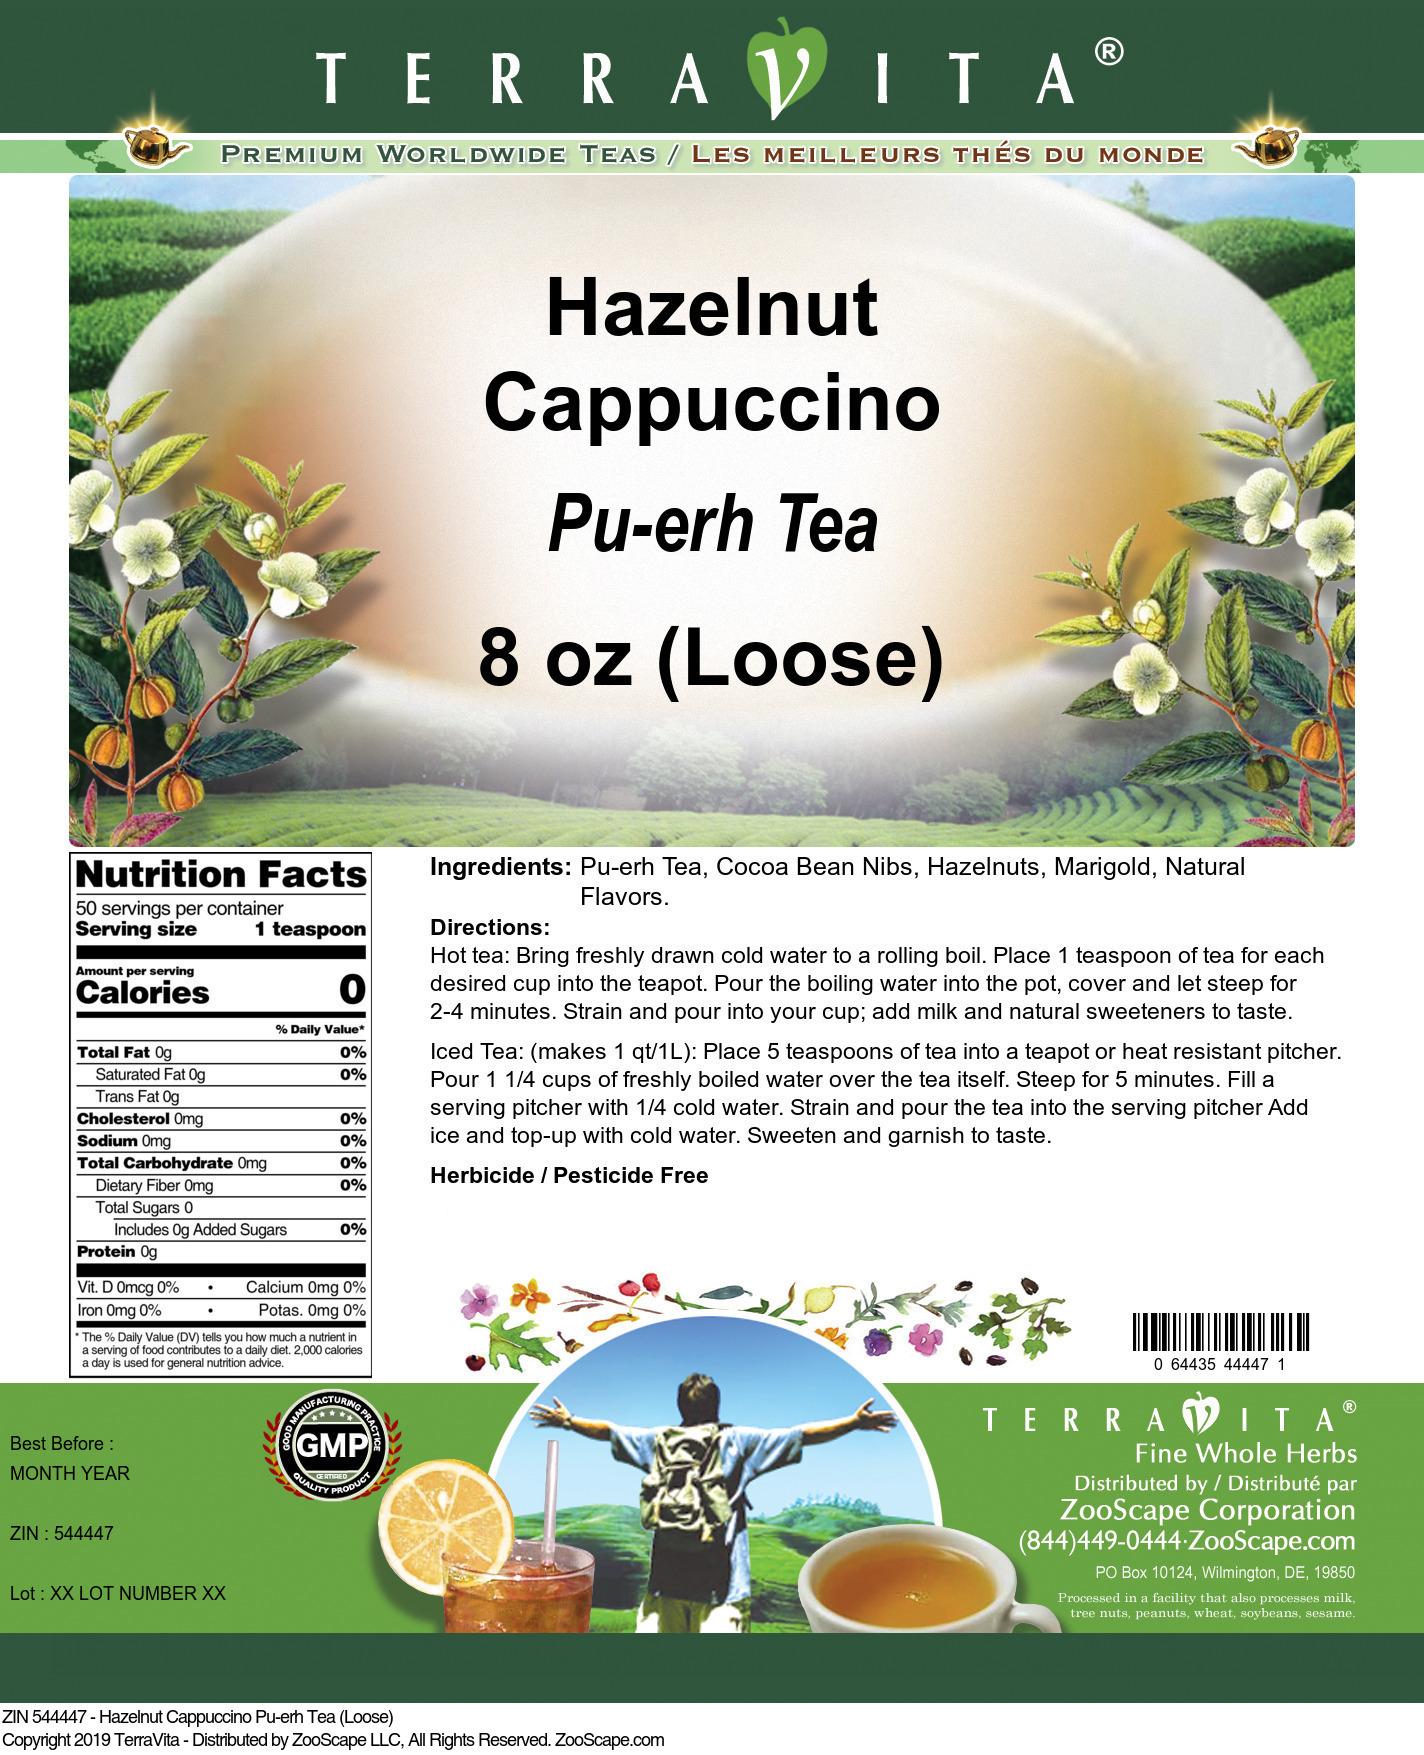 Hazelnut Cappuccino Pu-erh Tea